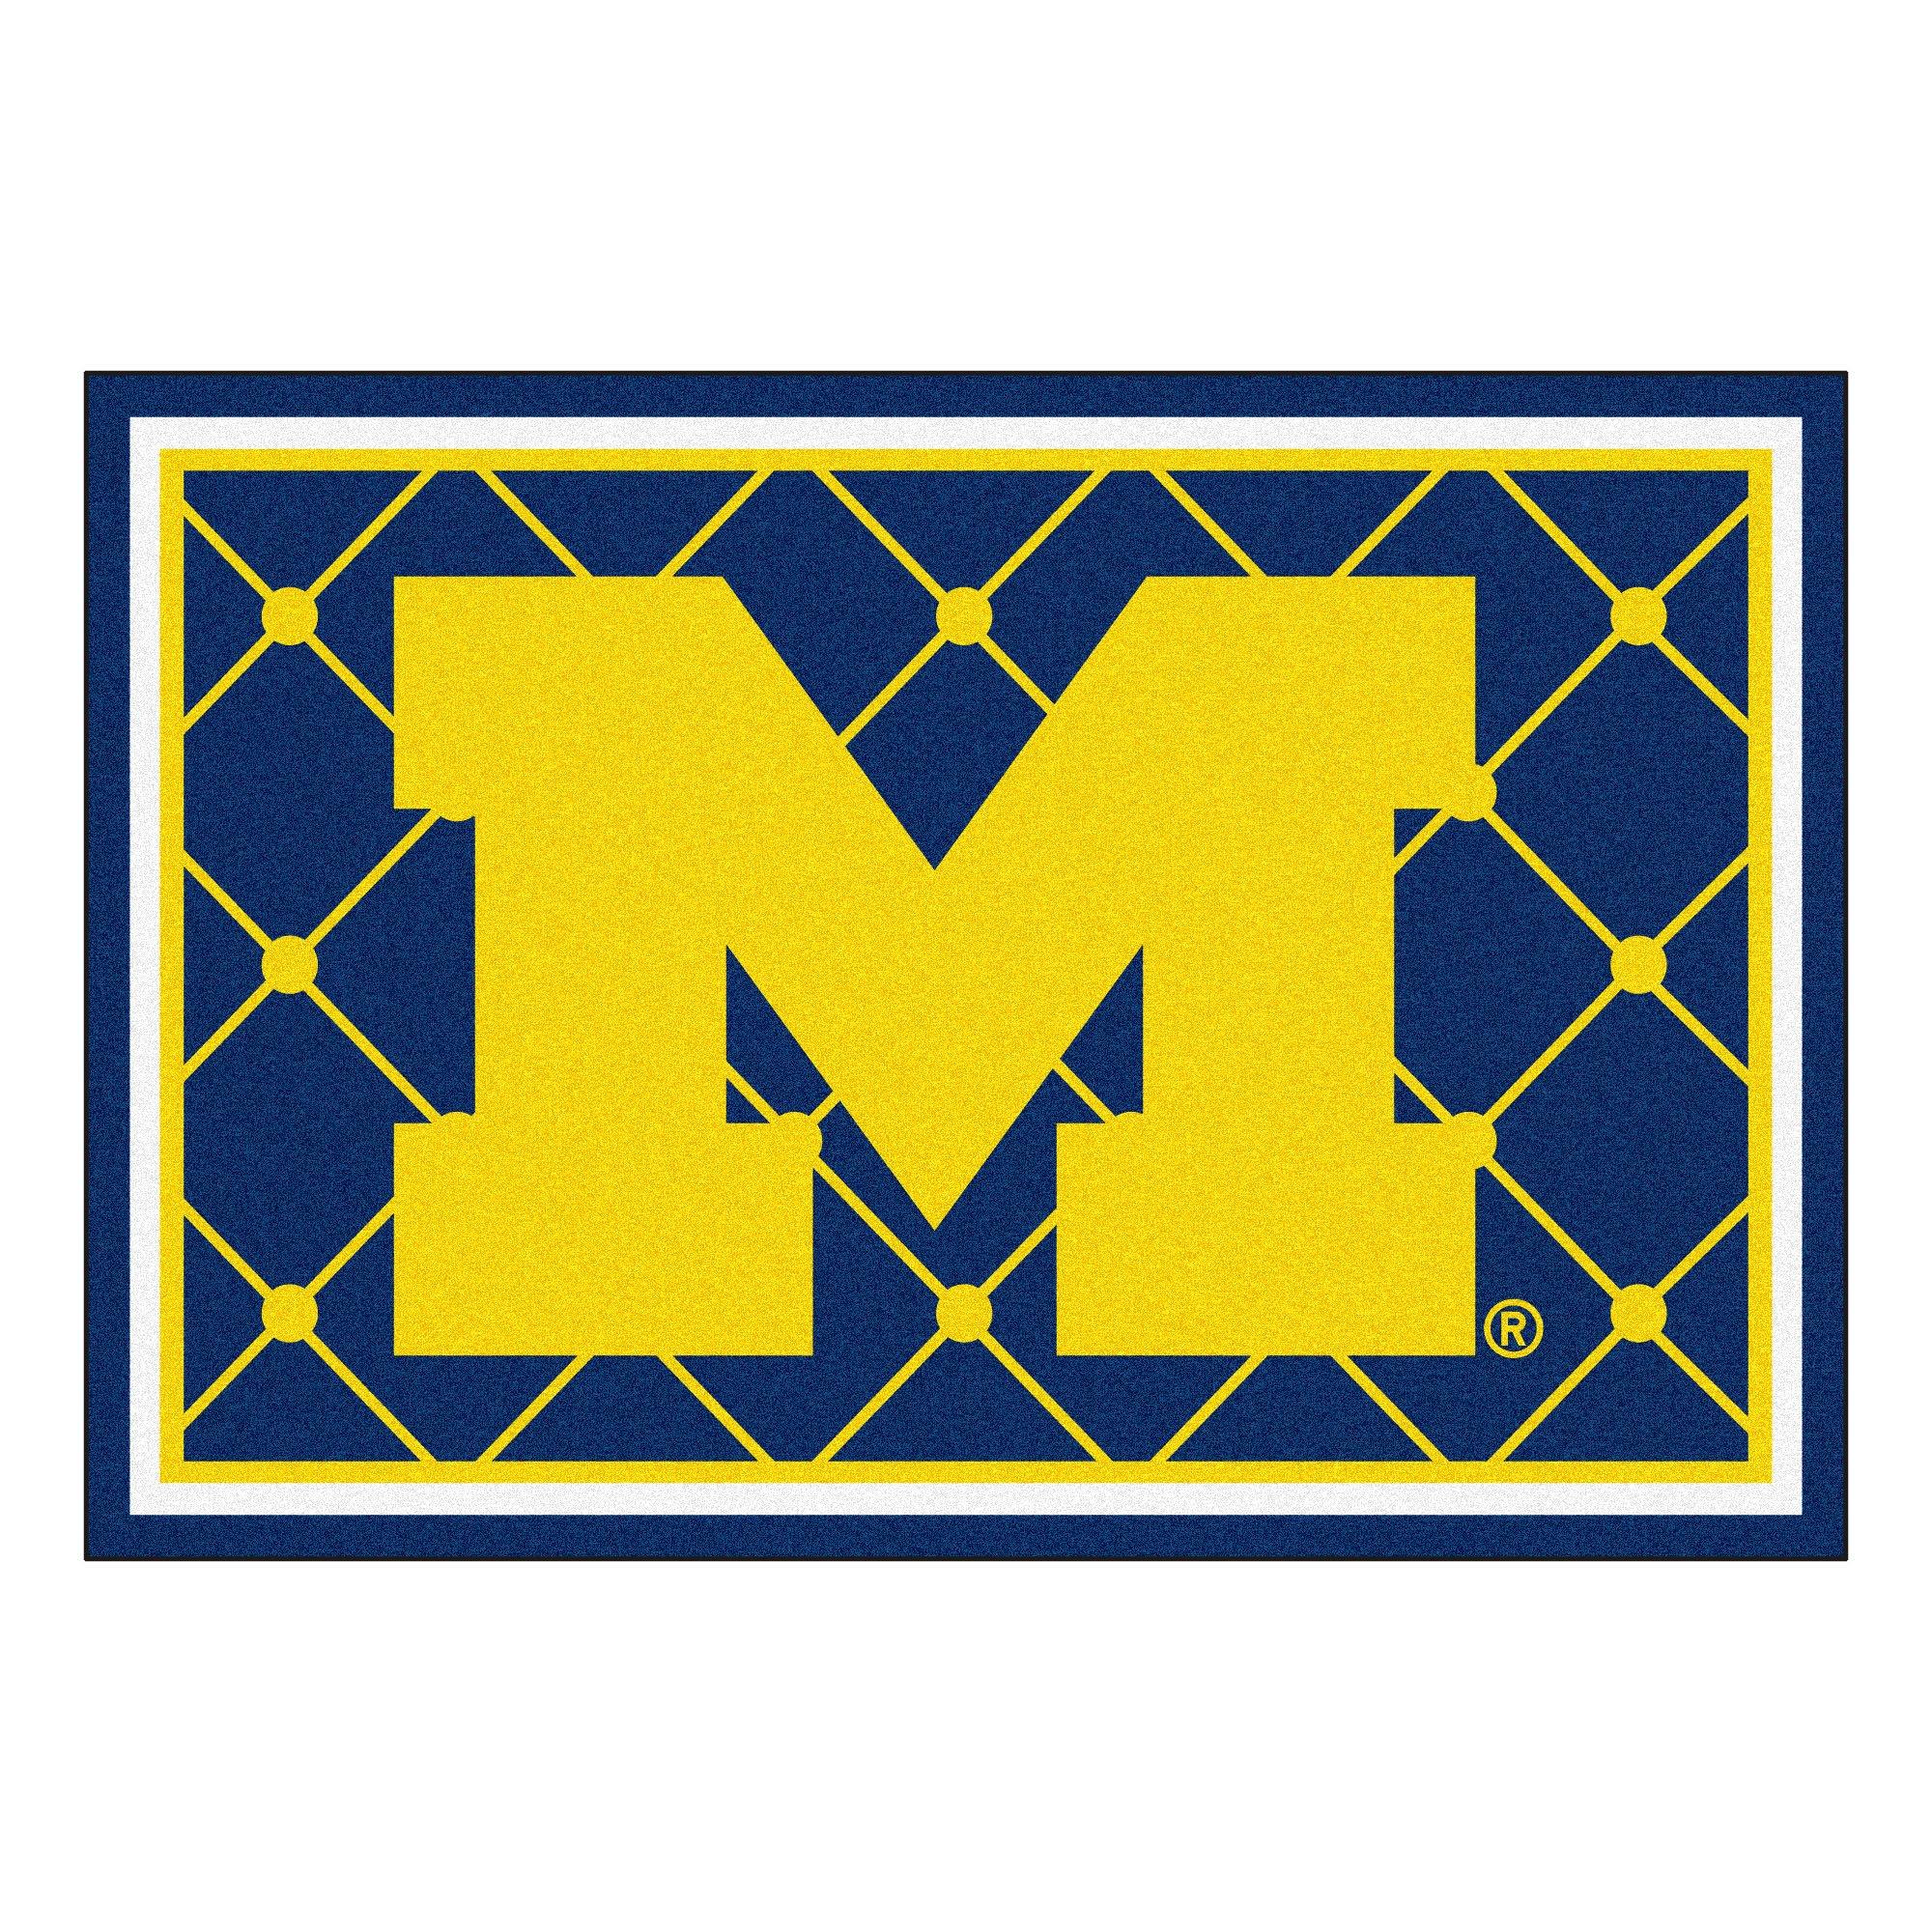 FANMATS NCAA University of Michigan Wolverines Nylon Face 5X8 Plush Rug by FANMATS (Image #1)